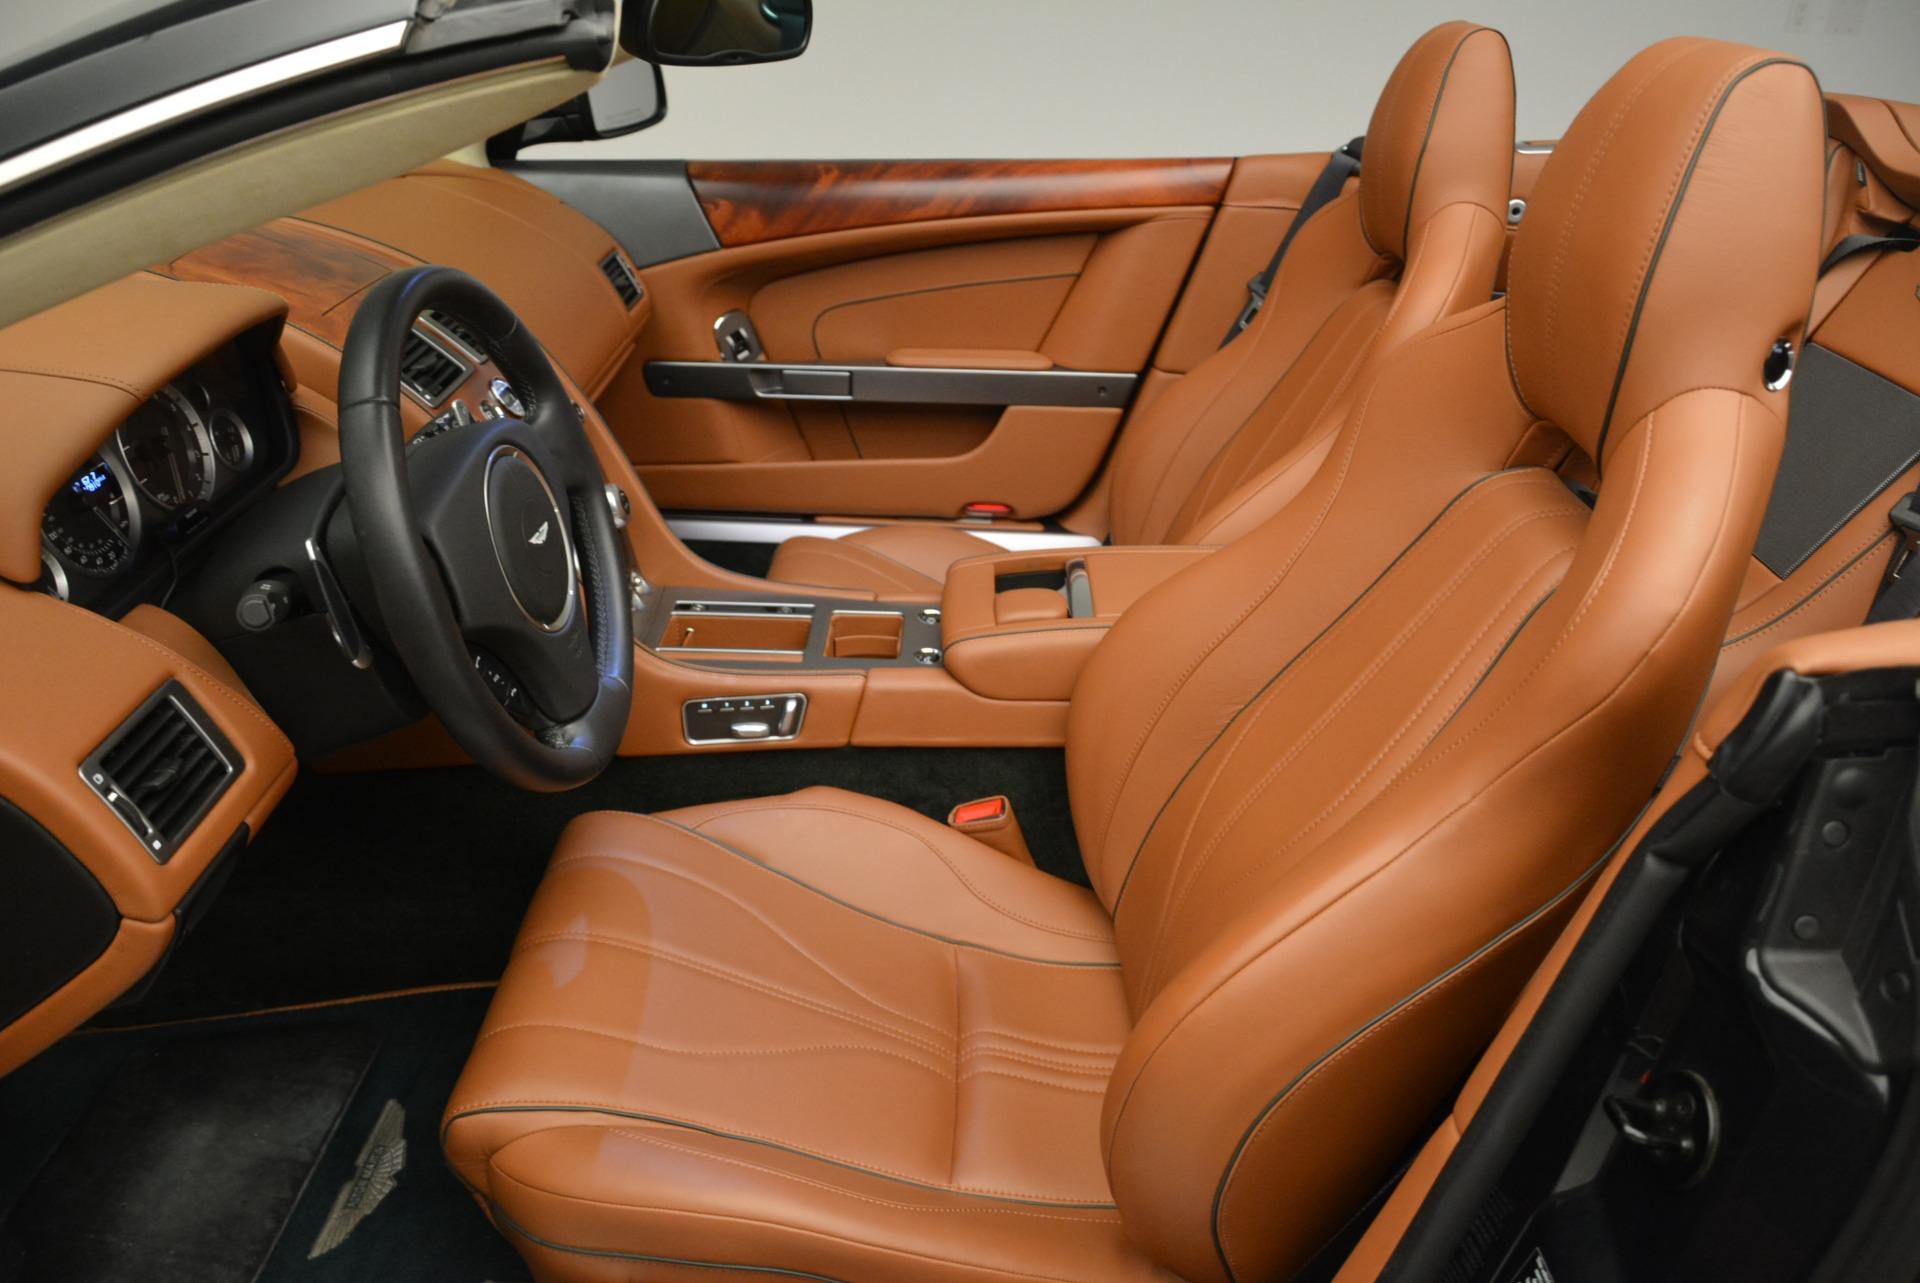 Used 2012 Aston Martin Virage Volante For Sale In Westport, CT 2508_p19